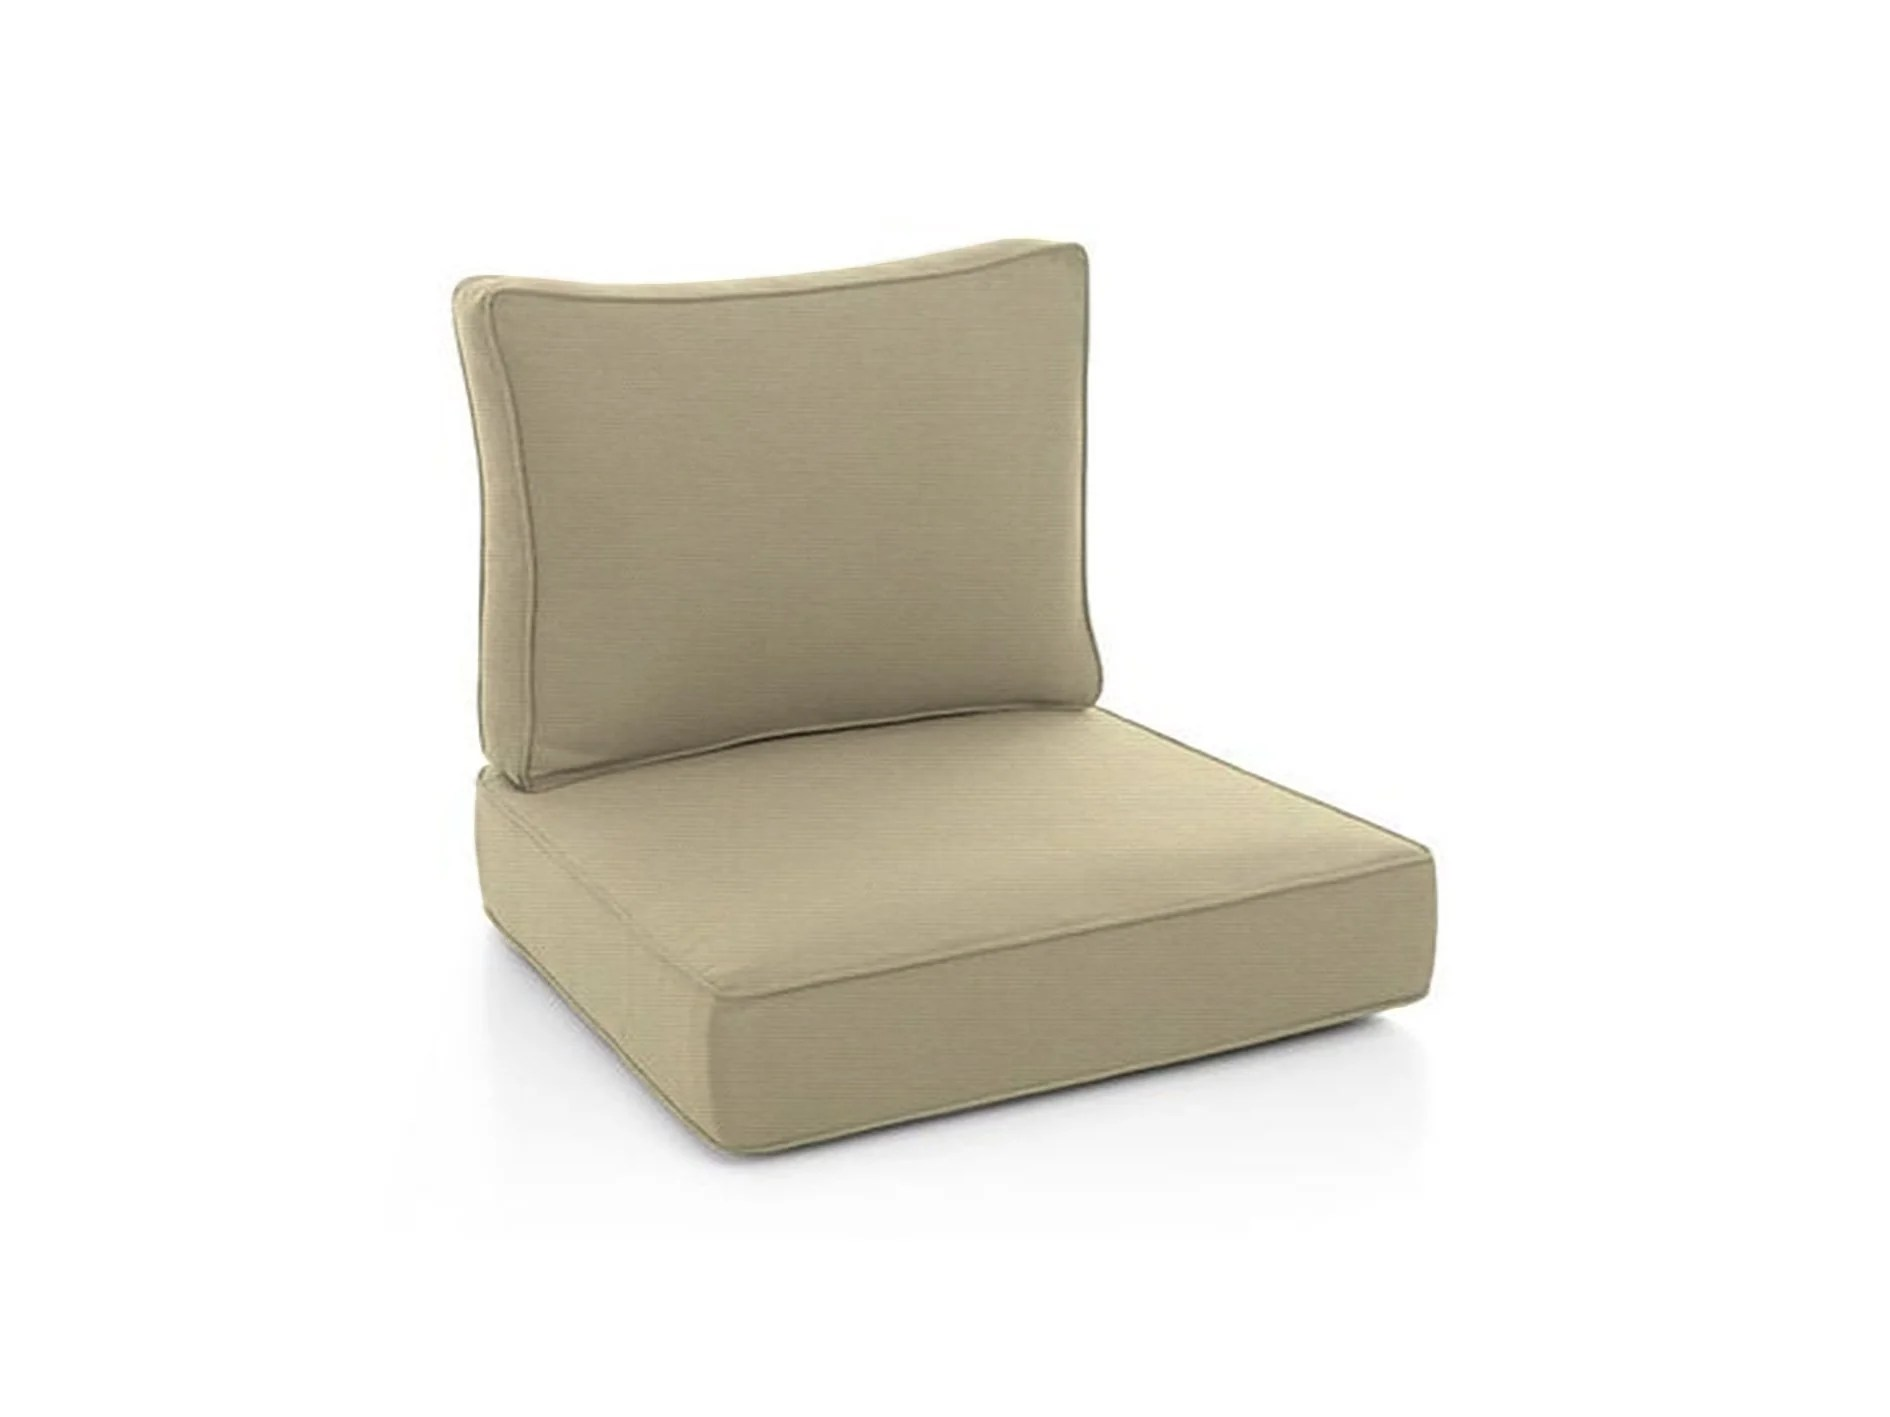 chair cushion foam student desk and combo sunbrella outdoor custom cushions sales